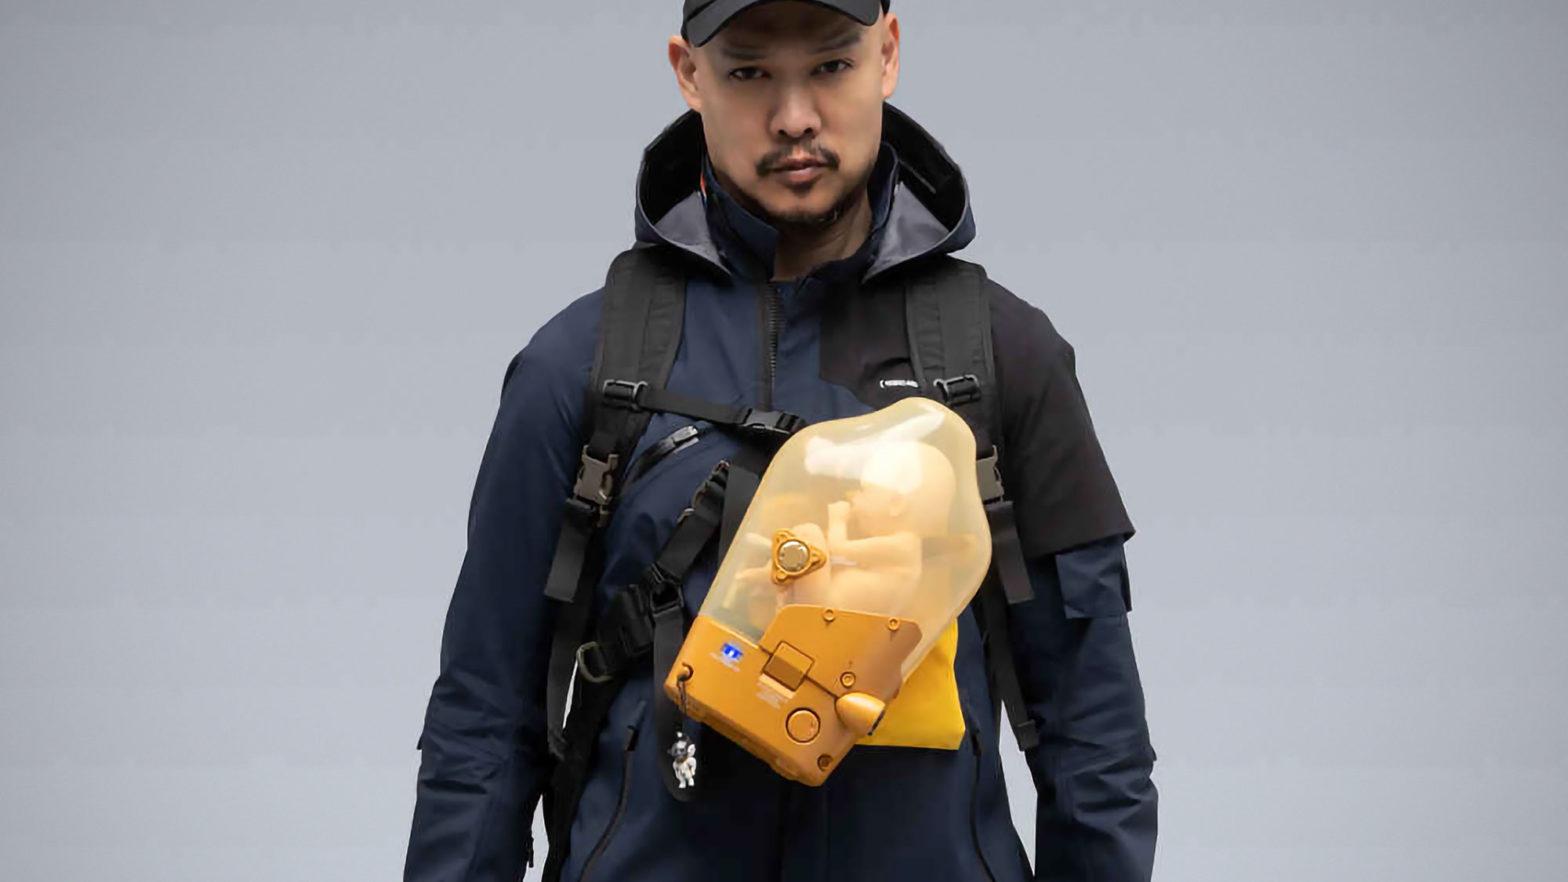 Acronym J1A-GTKP Death Stranding Jacket